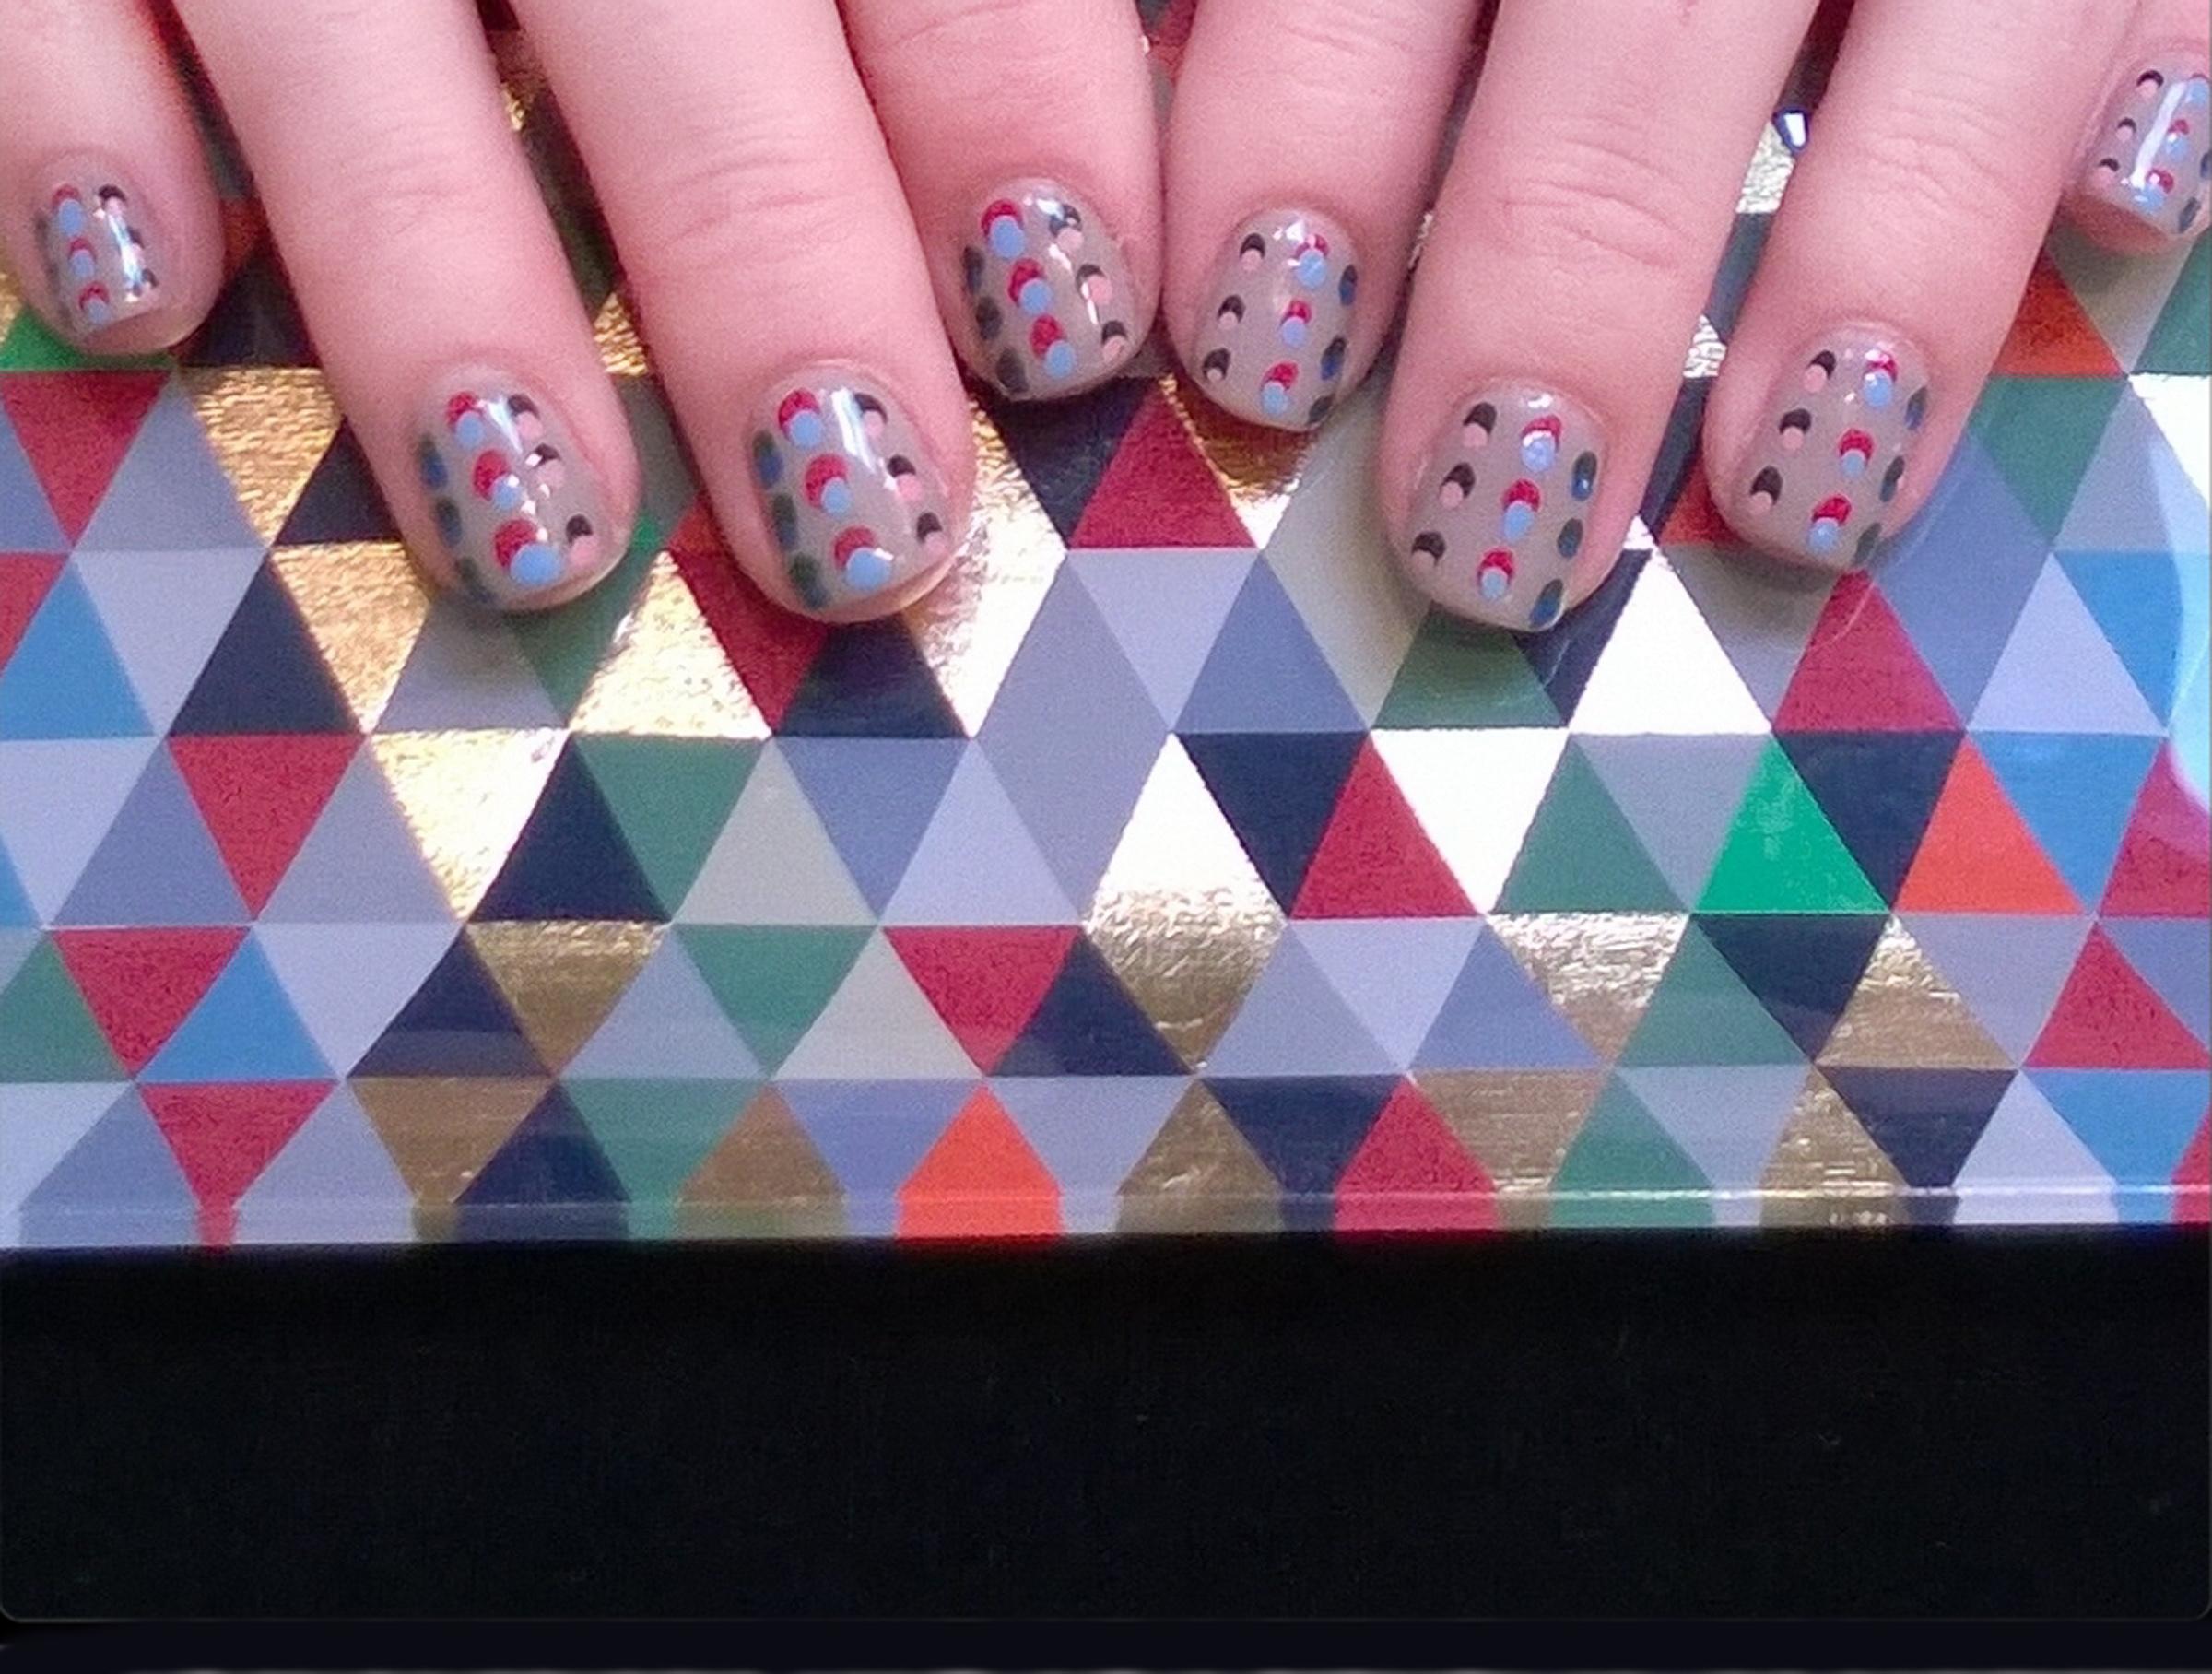 Rainbow nails  cropped.jpg